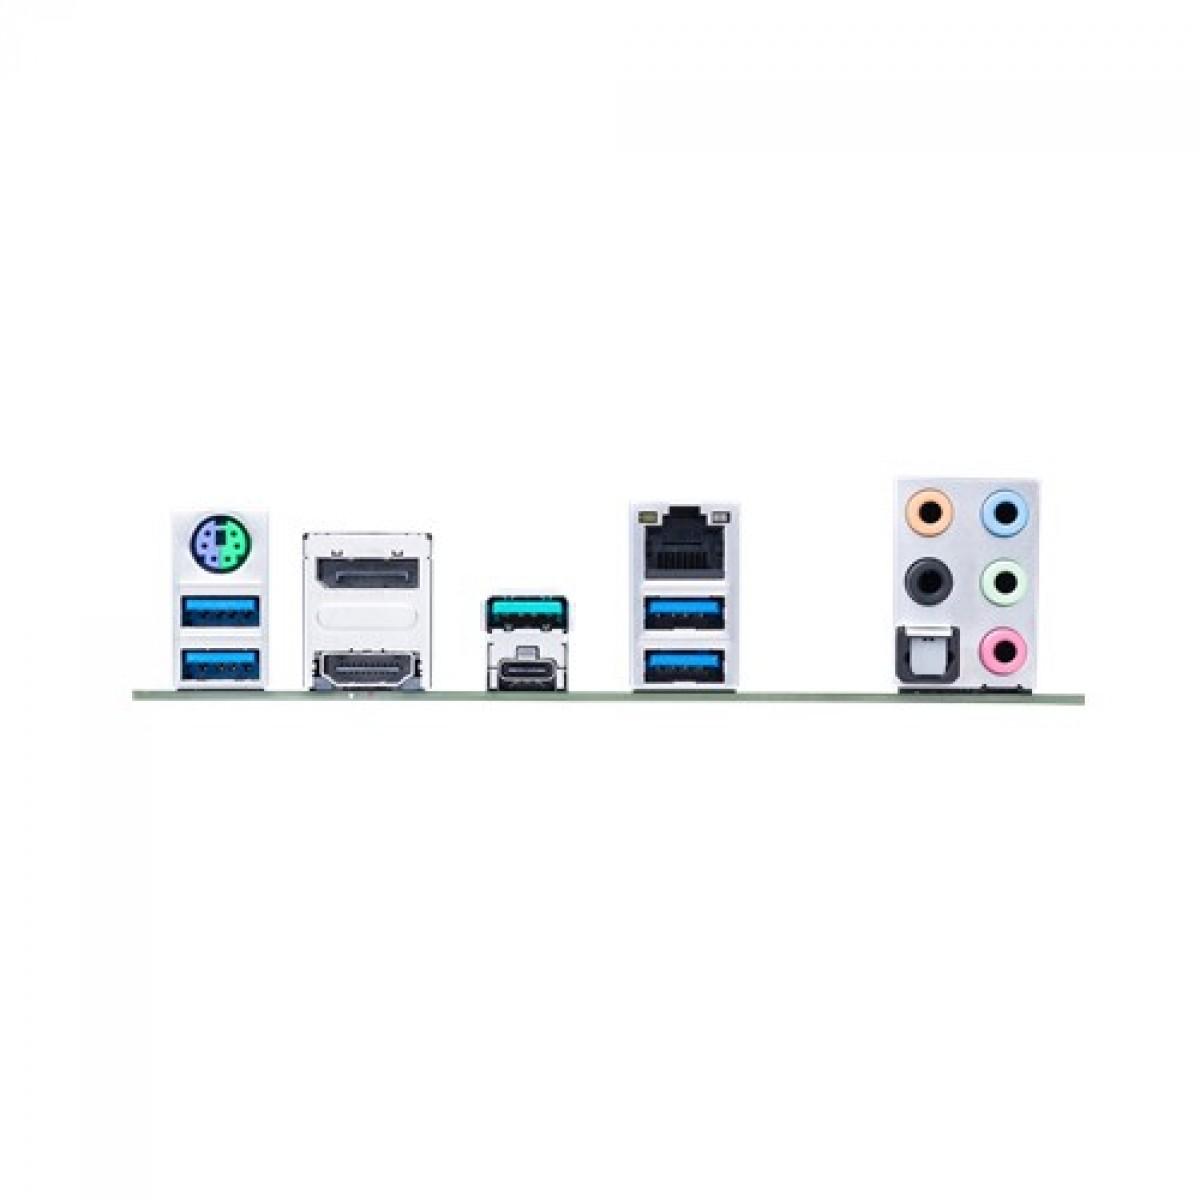 Placa Mãe Asus Z490-Plus Tuf Gaming, Chipset Z490, Intel LGA 1200, ATX, DDR4, 10ª Geração Intel - Open Box